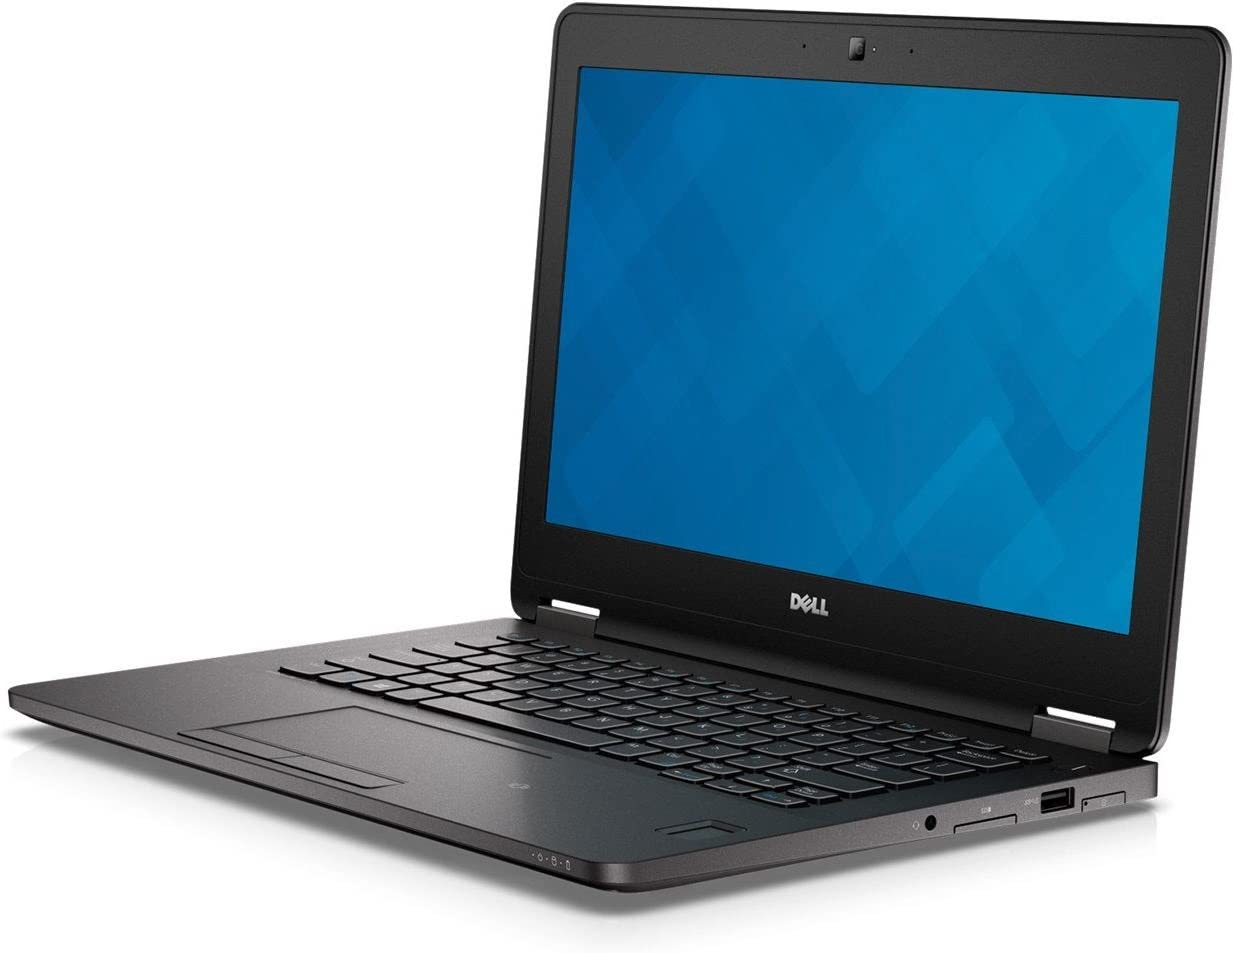 Dell Latitude Memphis Mall E7270 UltraBook Business Laptop 12.5